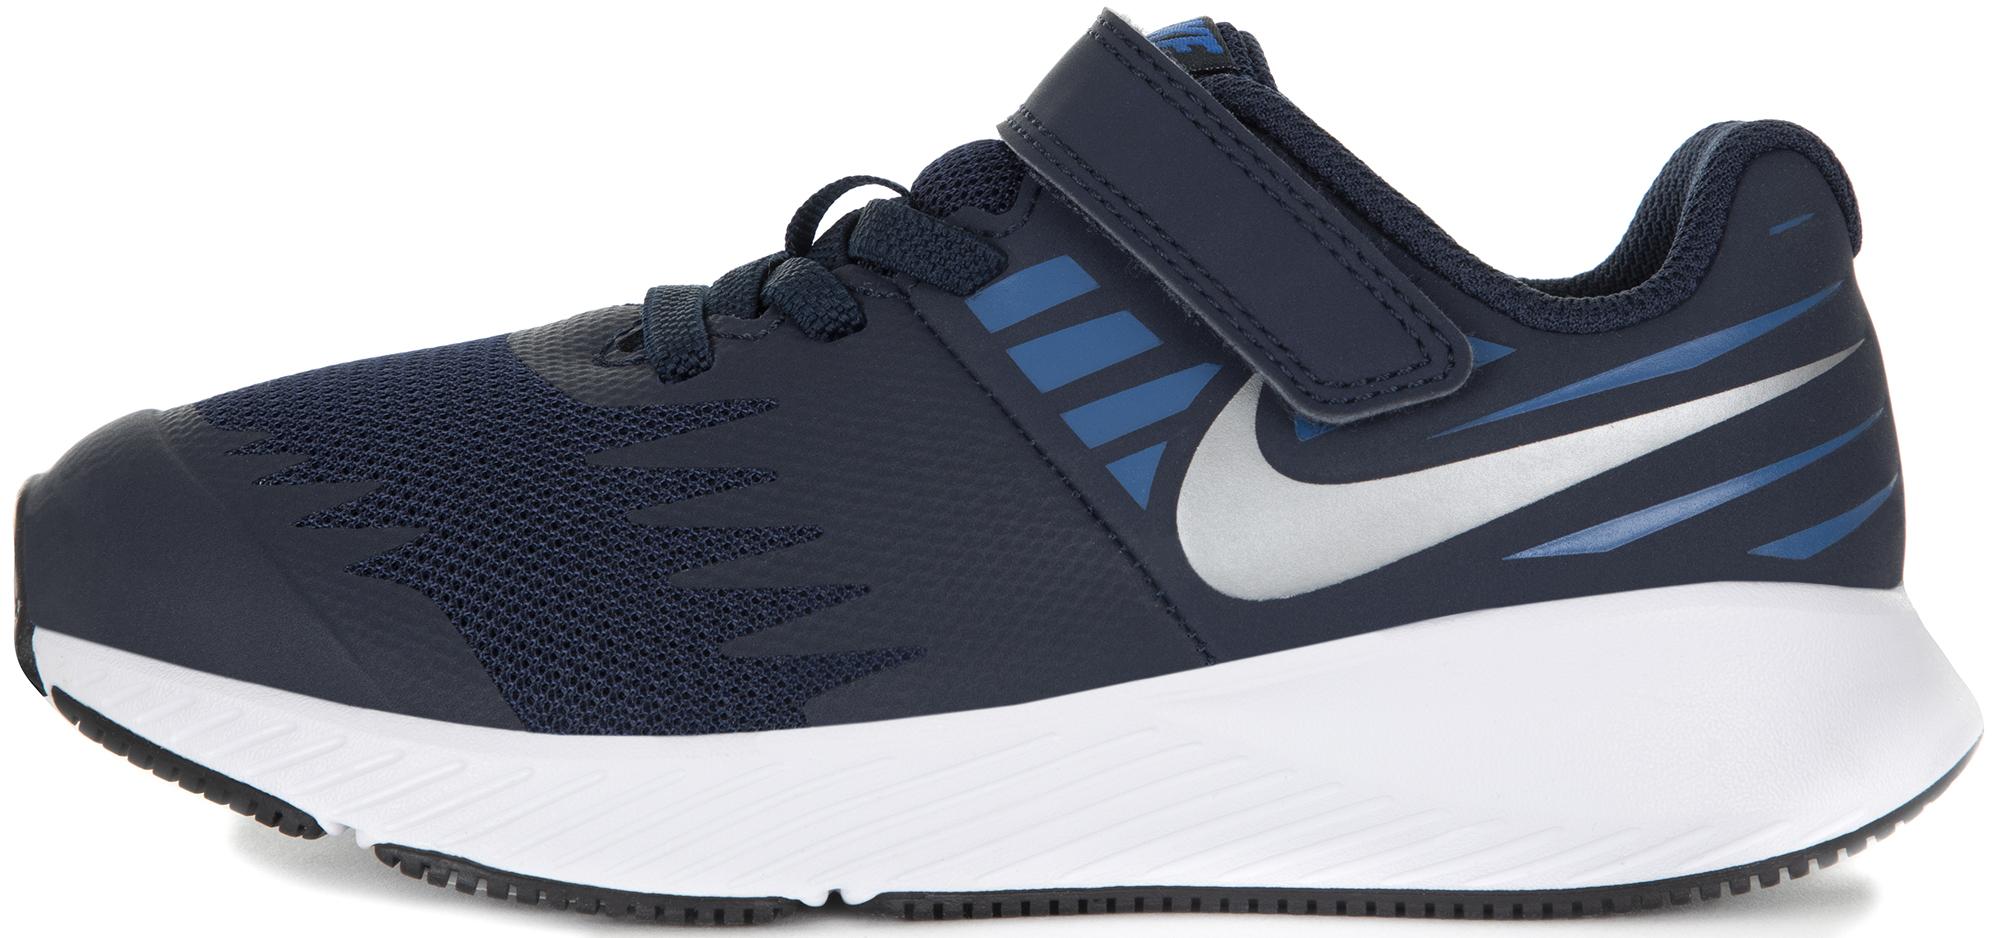 Nike Кроссовки для мальчиков Nike Star Runner, размер 34